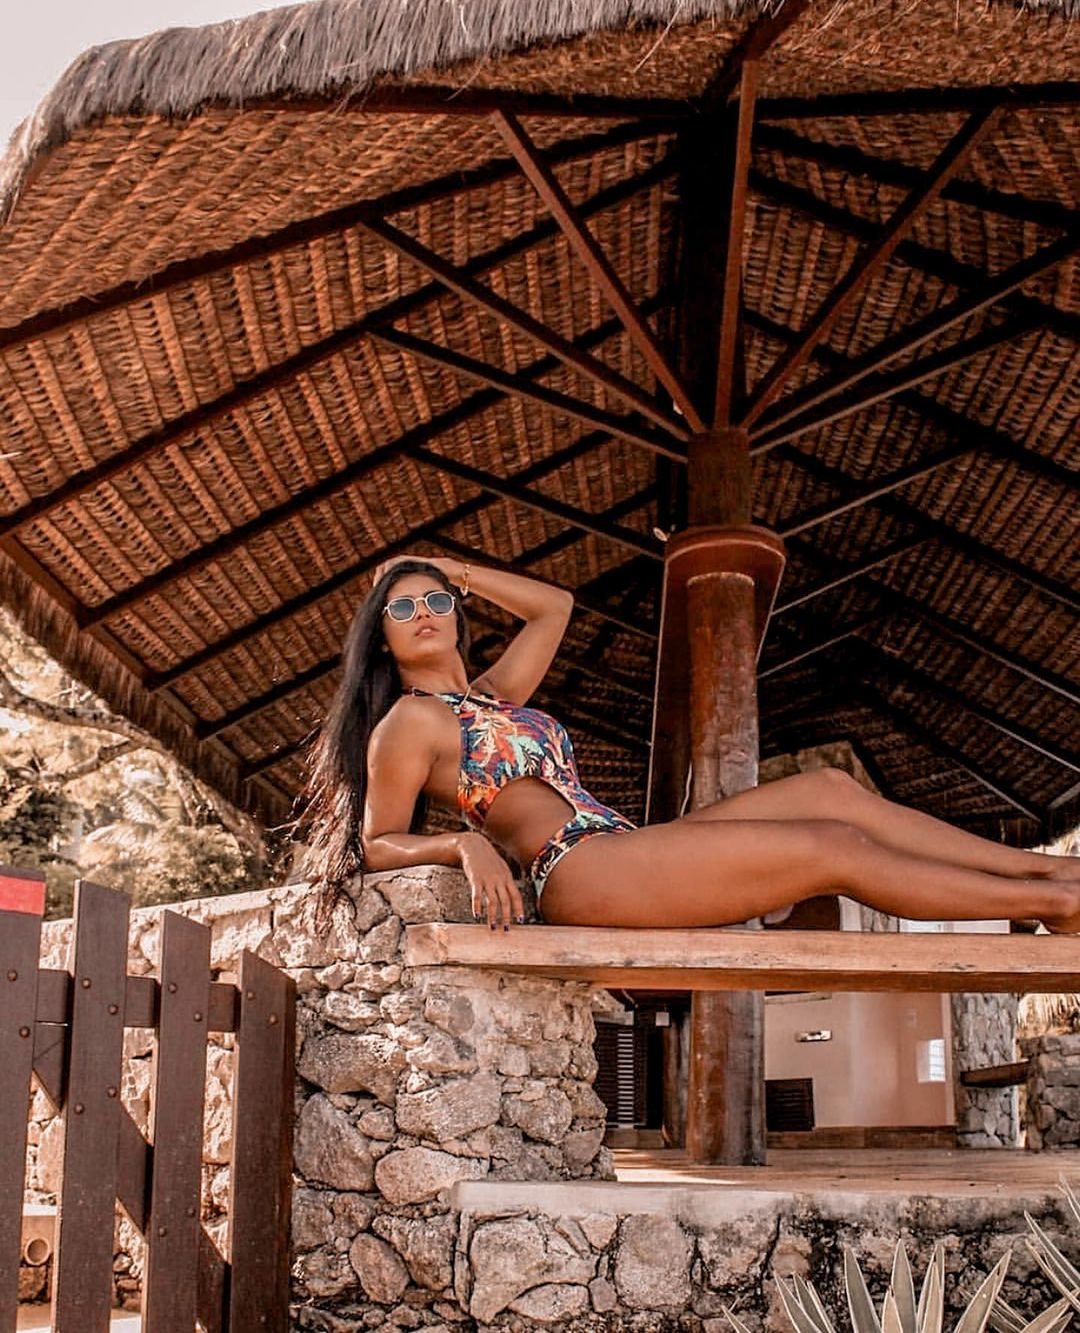 esthefane souza, top 20 de miss brasil mundo 2019. - Página 6 21282620